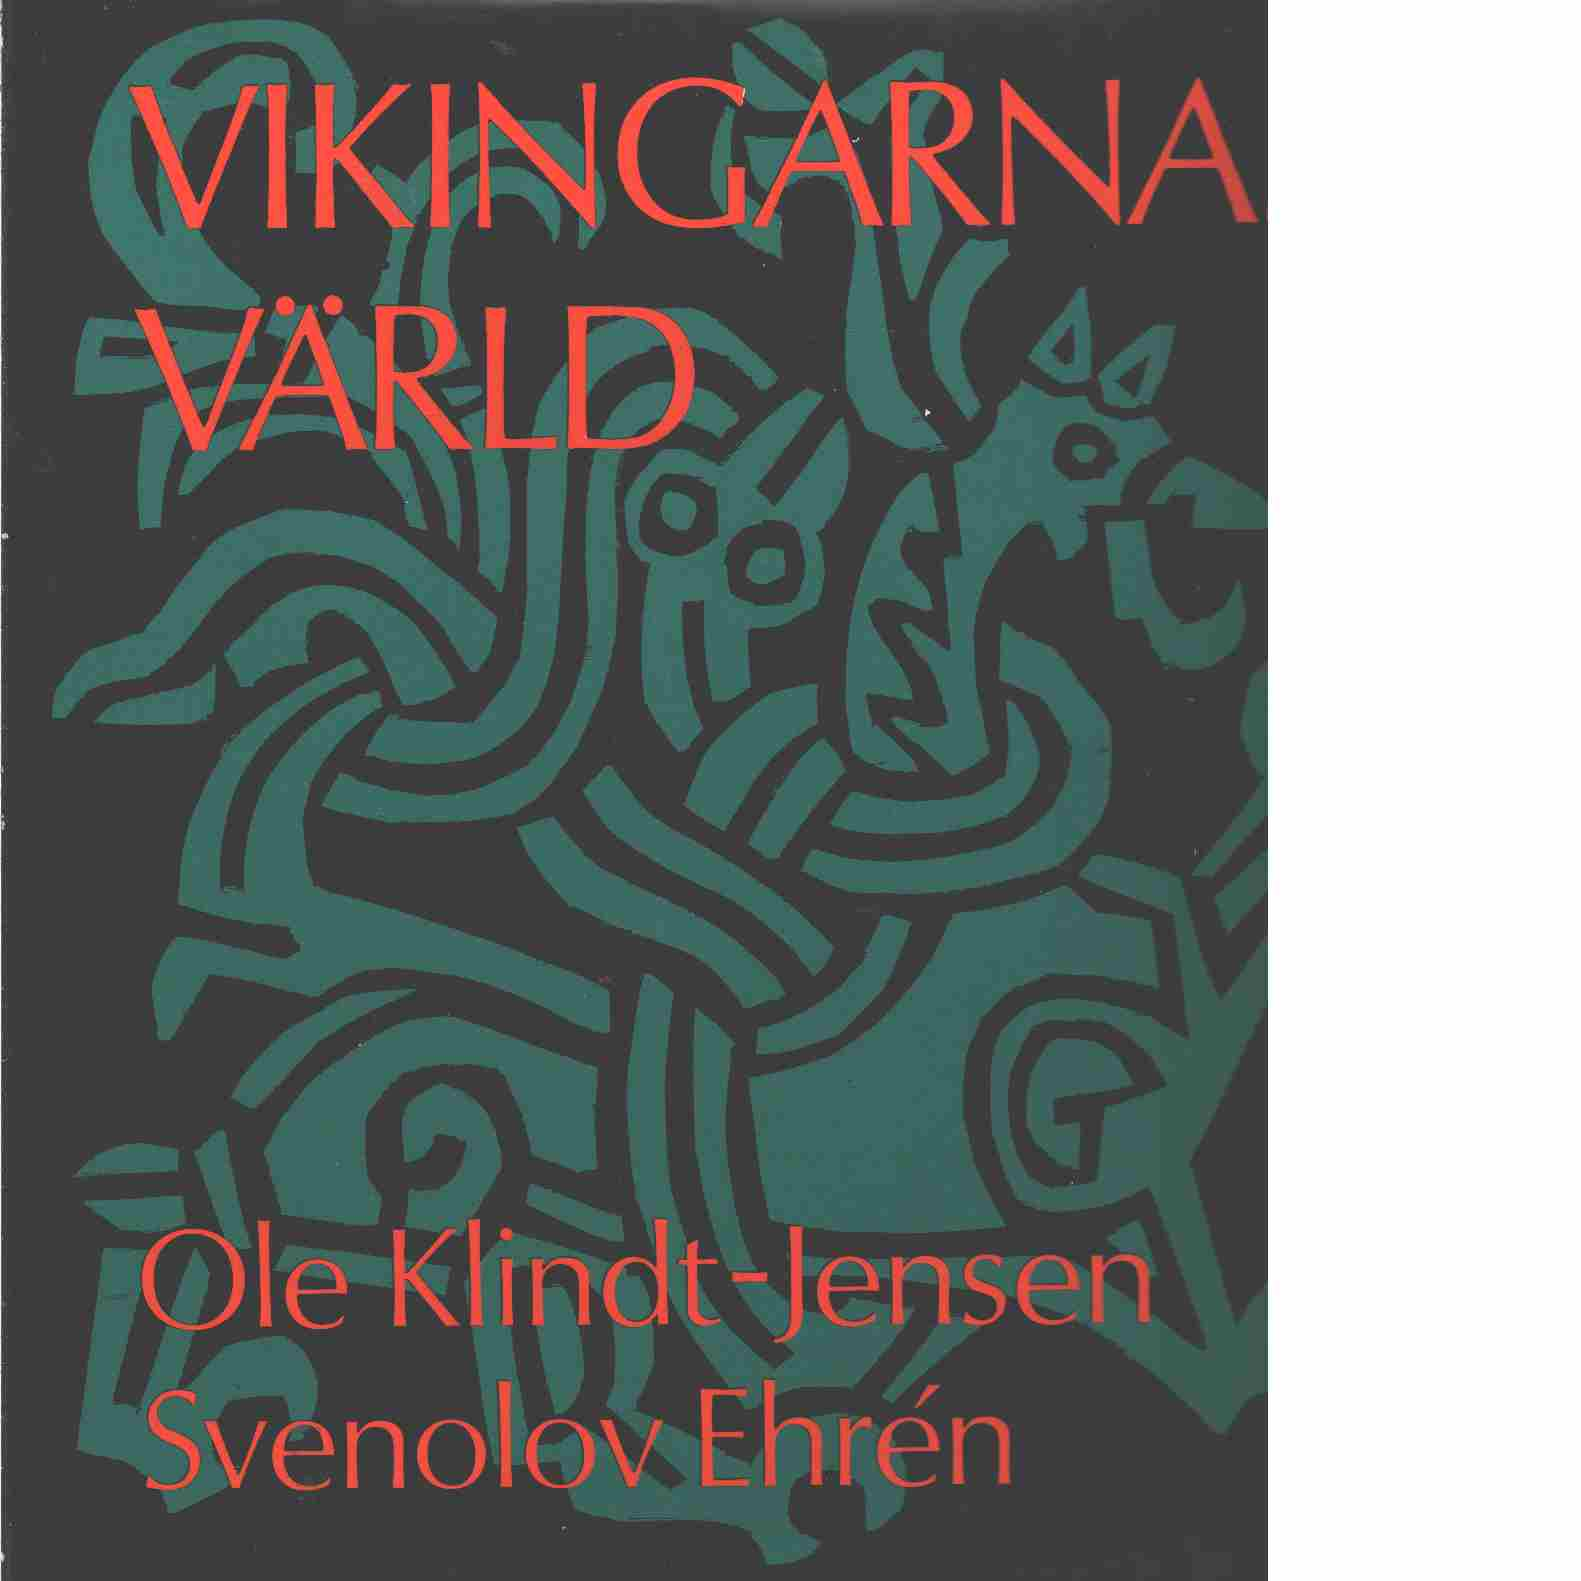 Vikingarnas värld - Klindt-Jensen, Ole